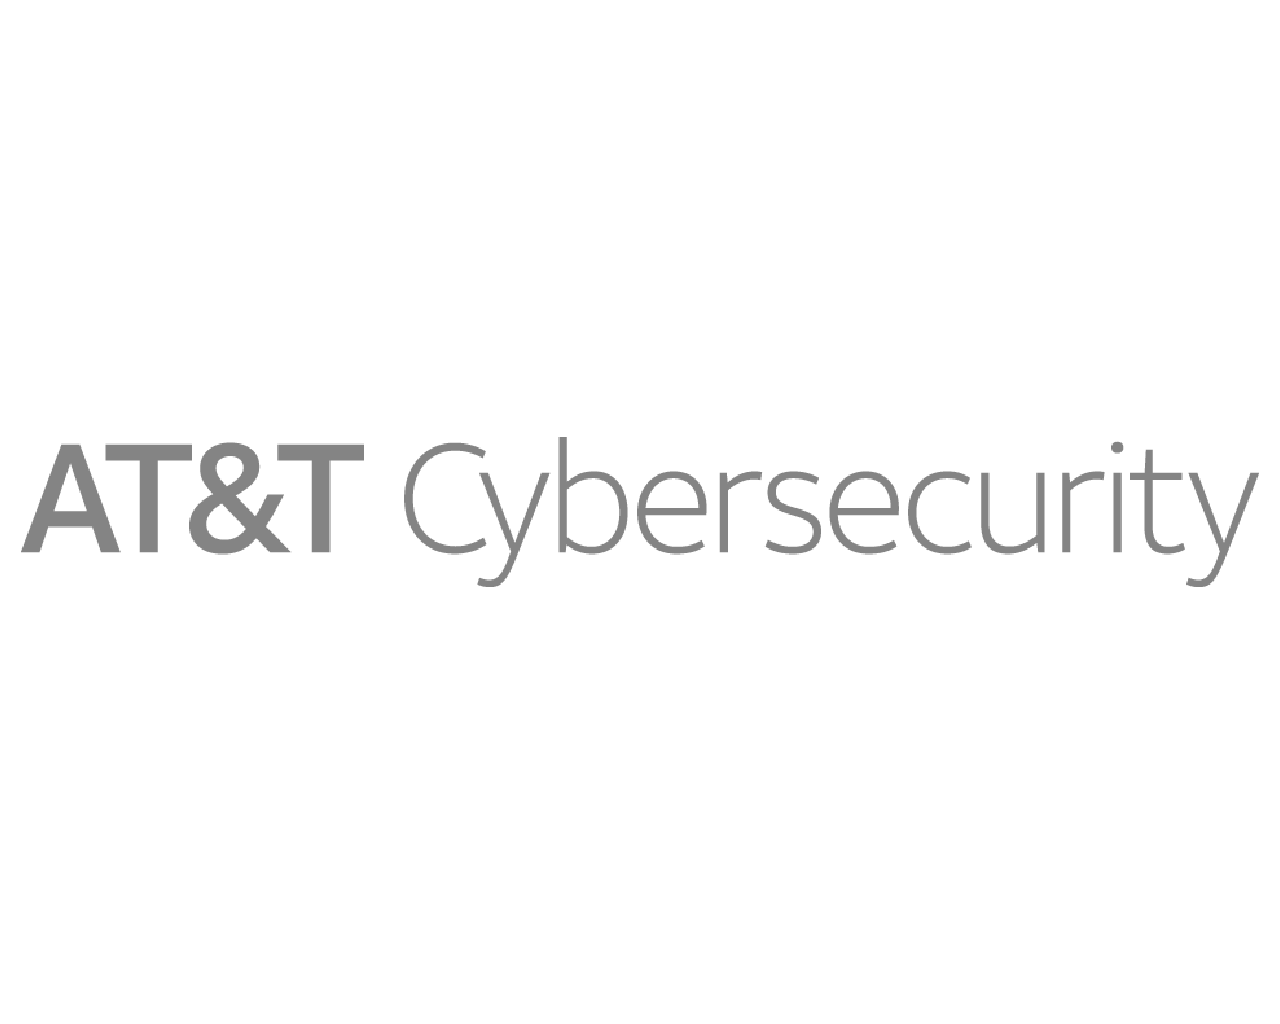 att cybersecurity logo